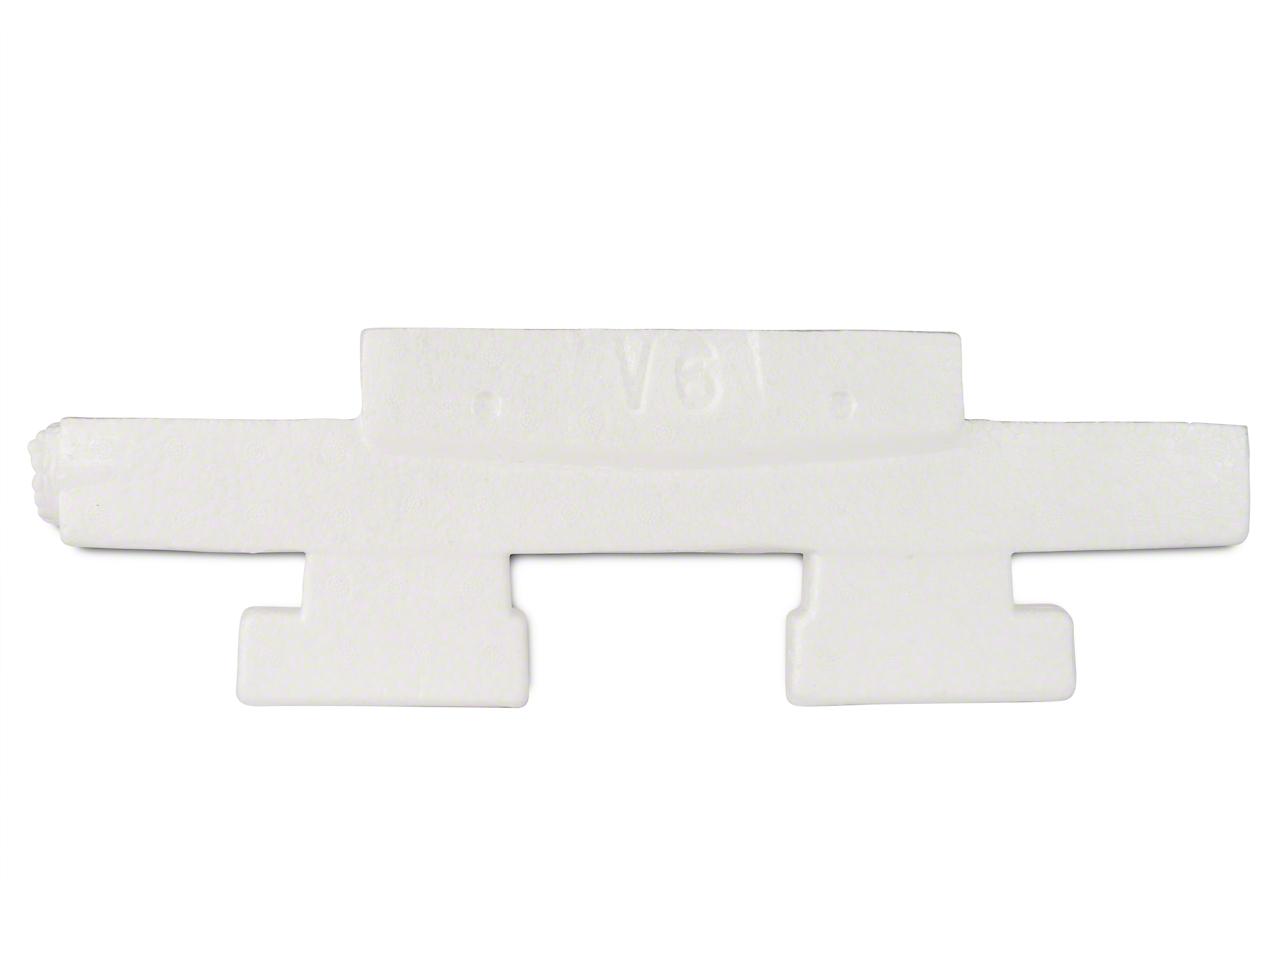 Foam Front Upper Impact Absorber (05-09 V6)